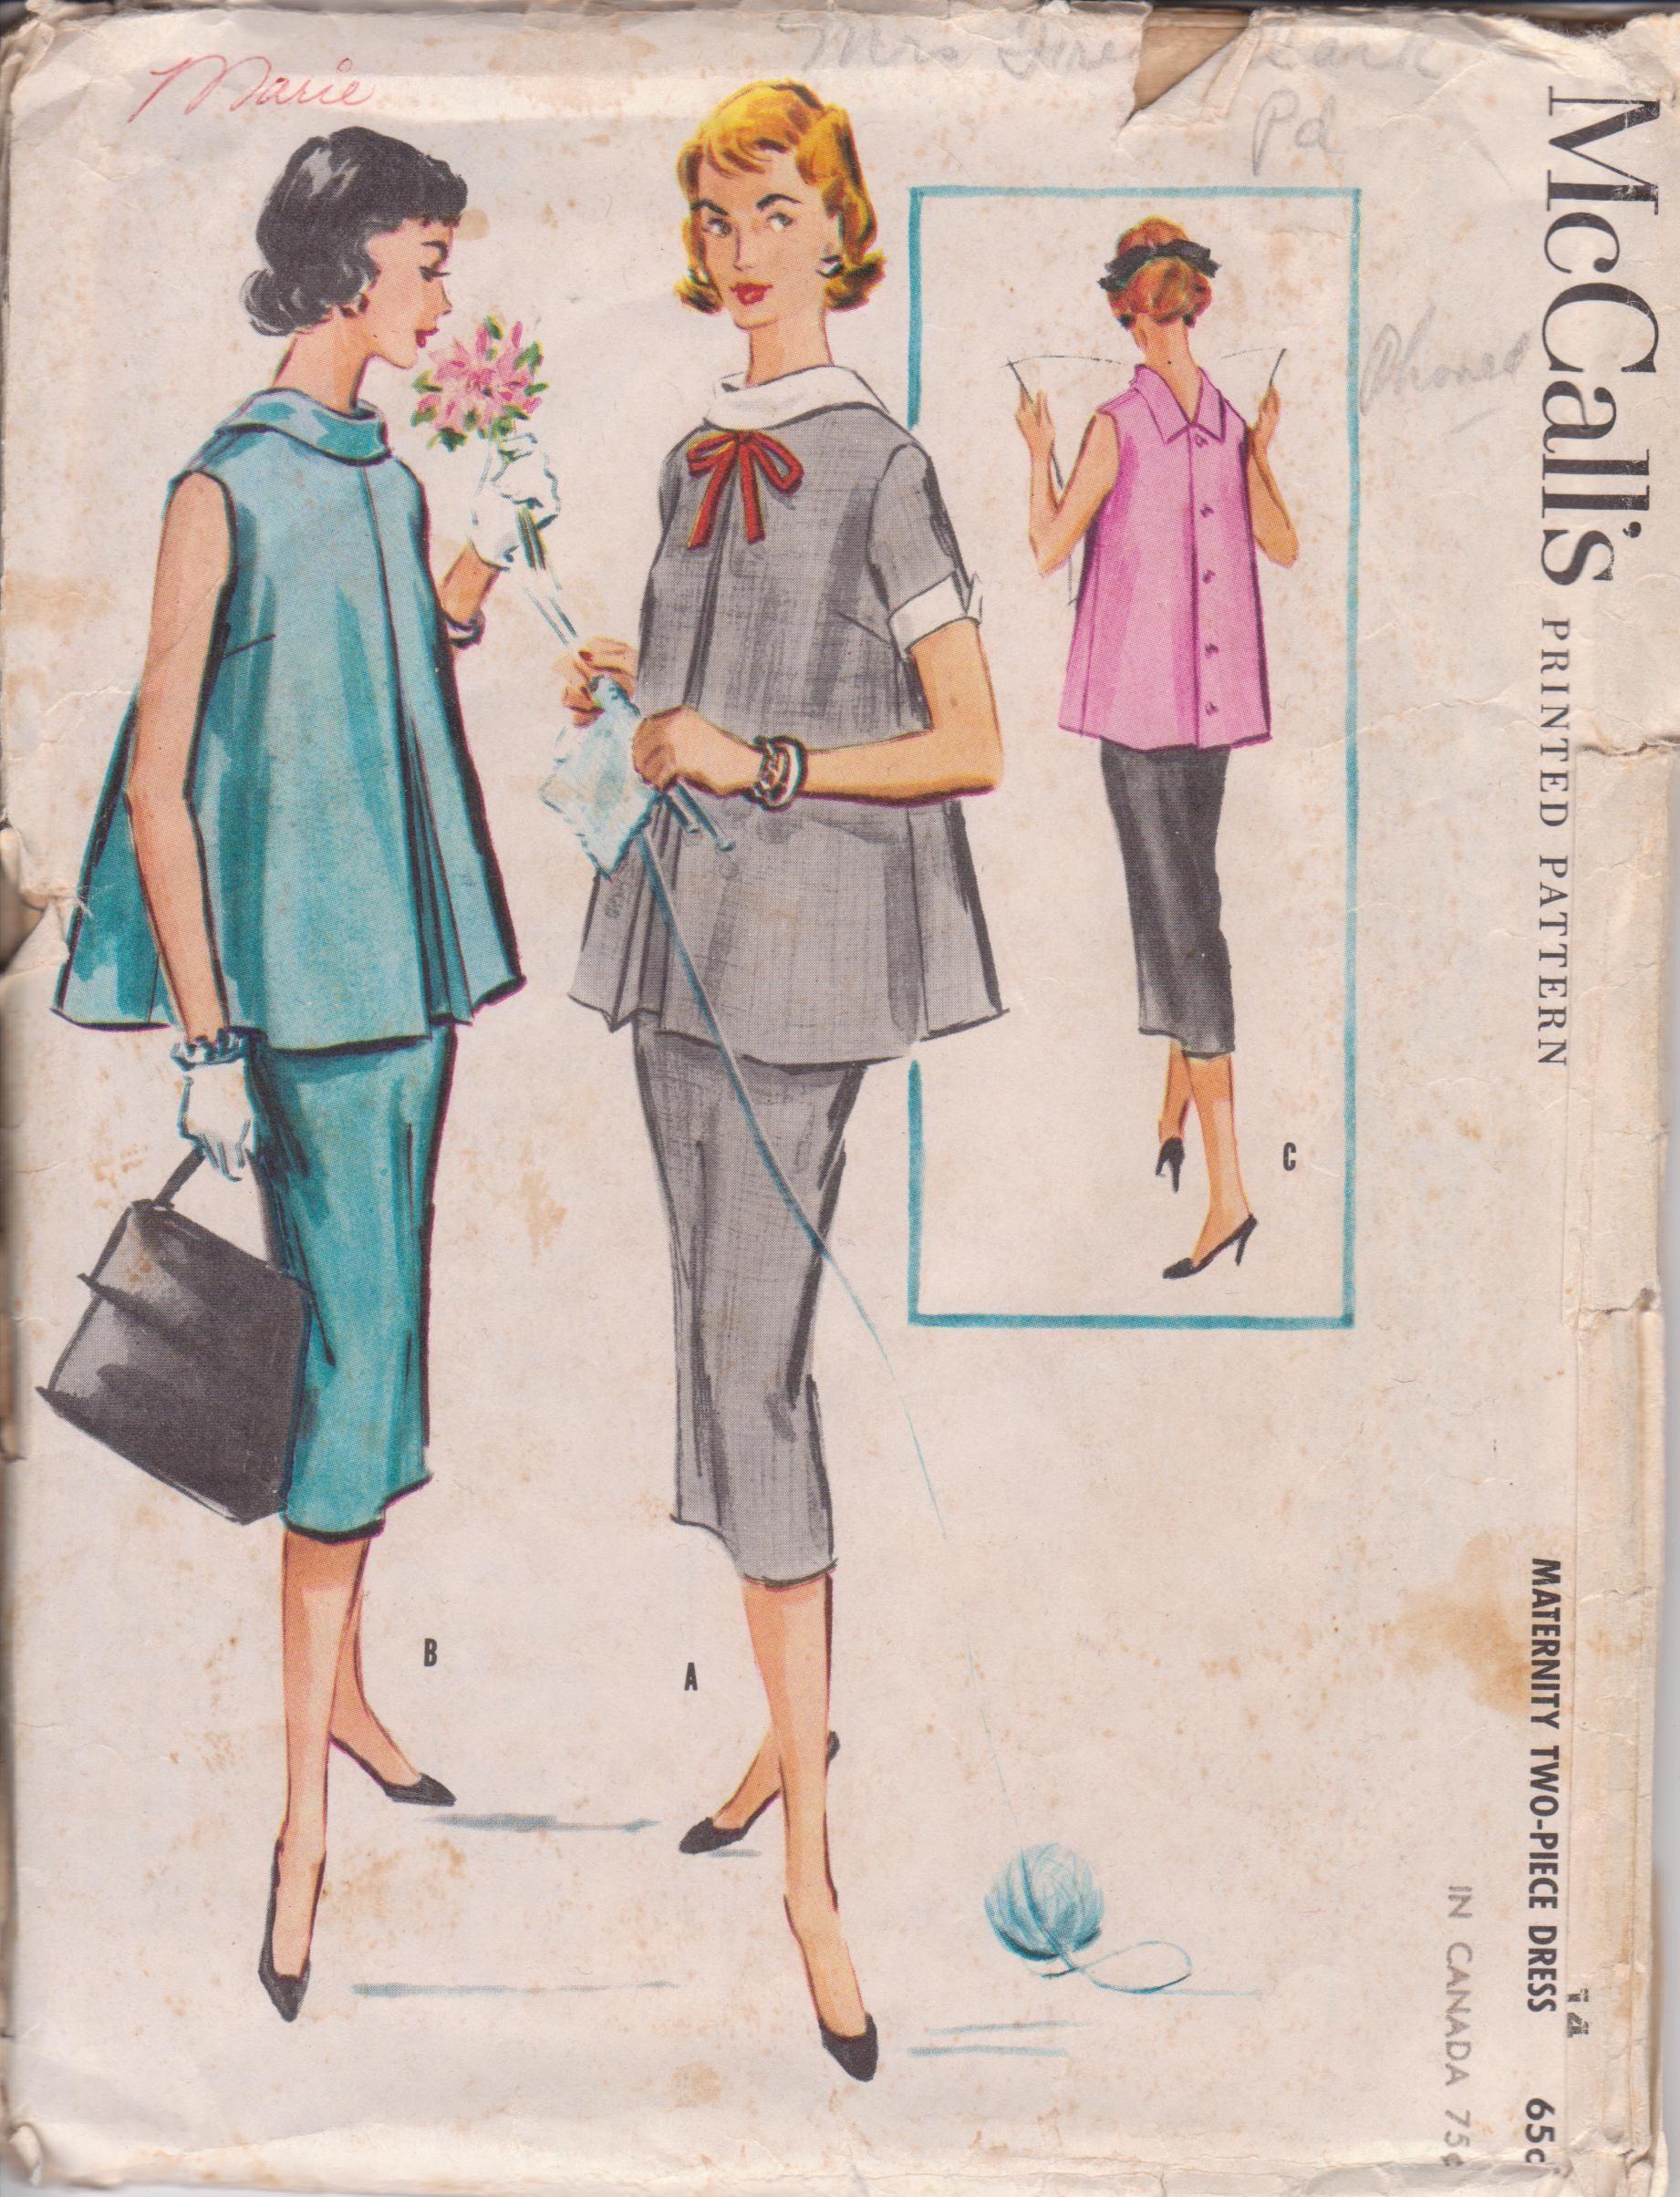 Vintage mccalls maternity pattern sew retro pinterest vintage maternity two piece dress sew pattern mccalls 3877 size 14 ombrellifo Gallery